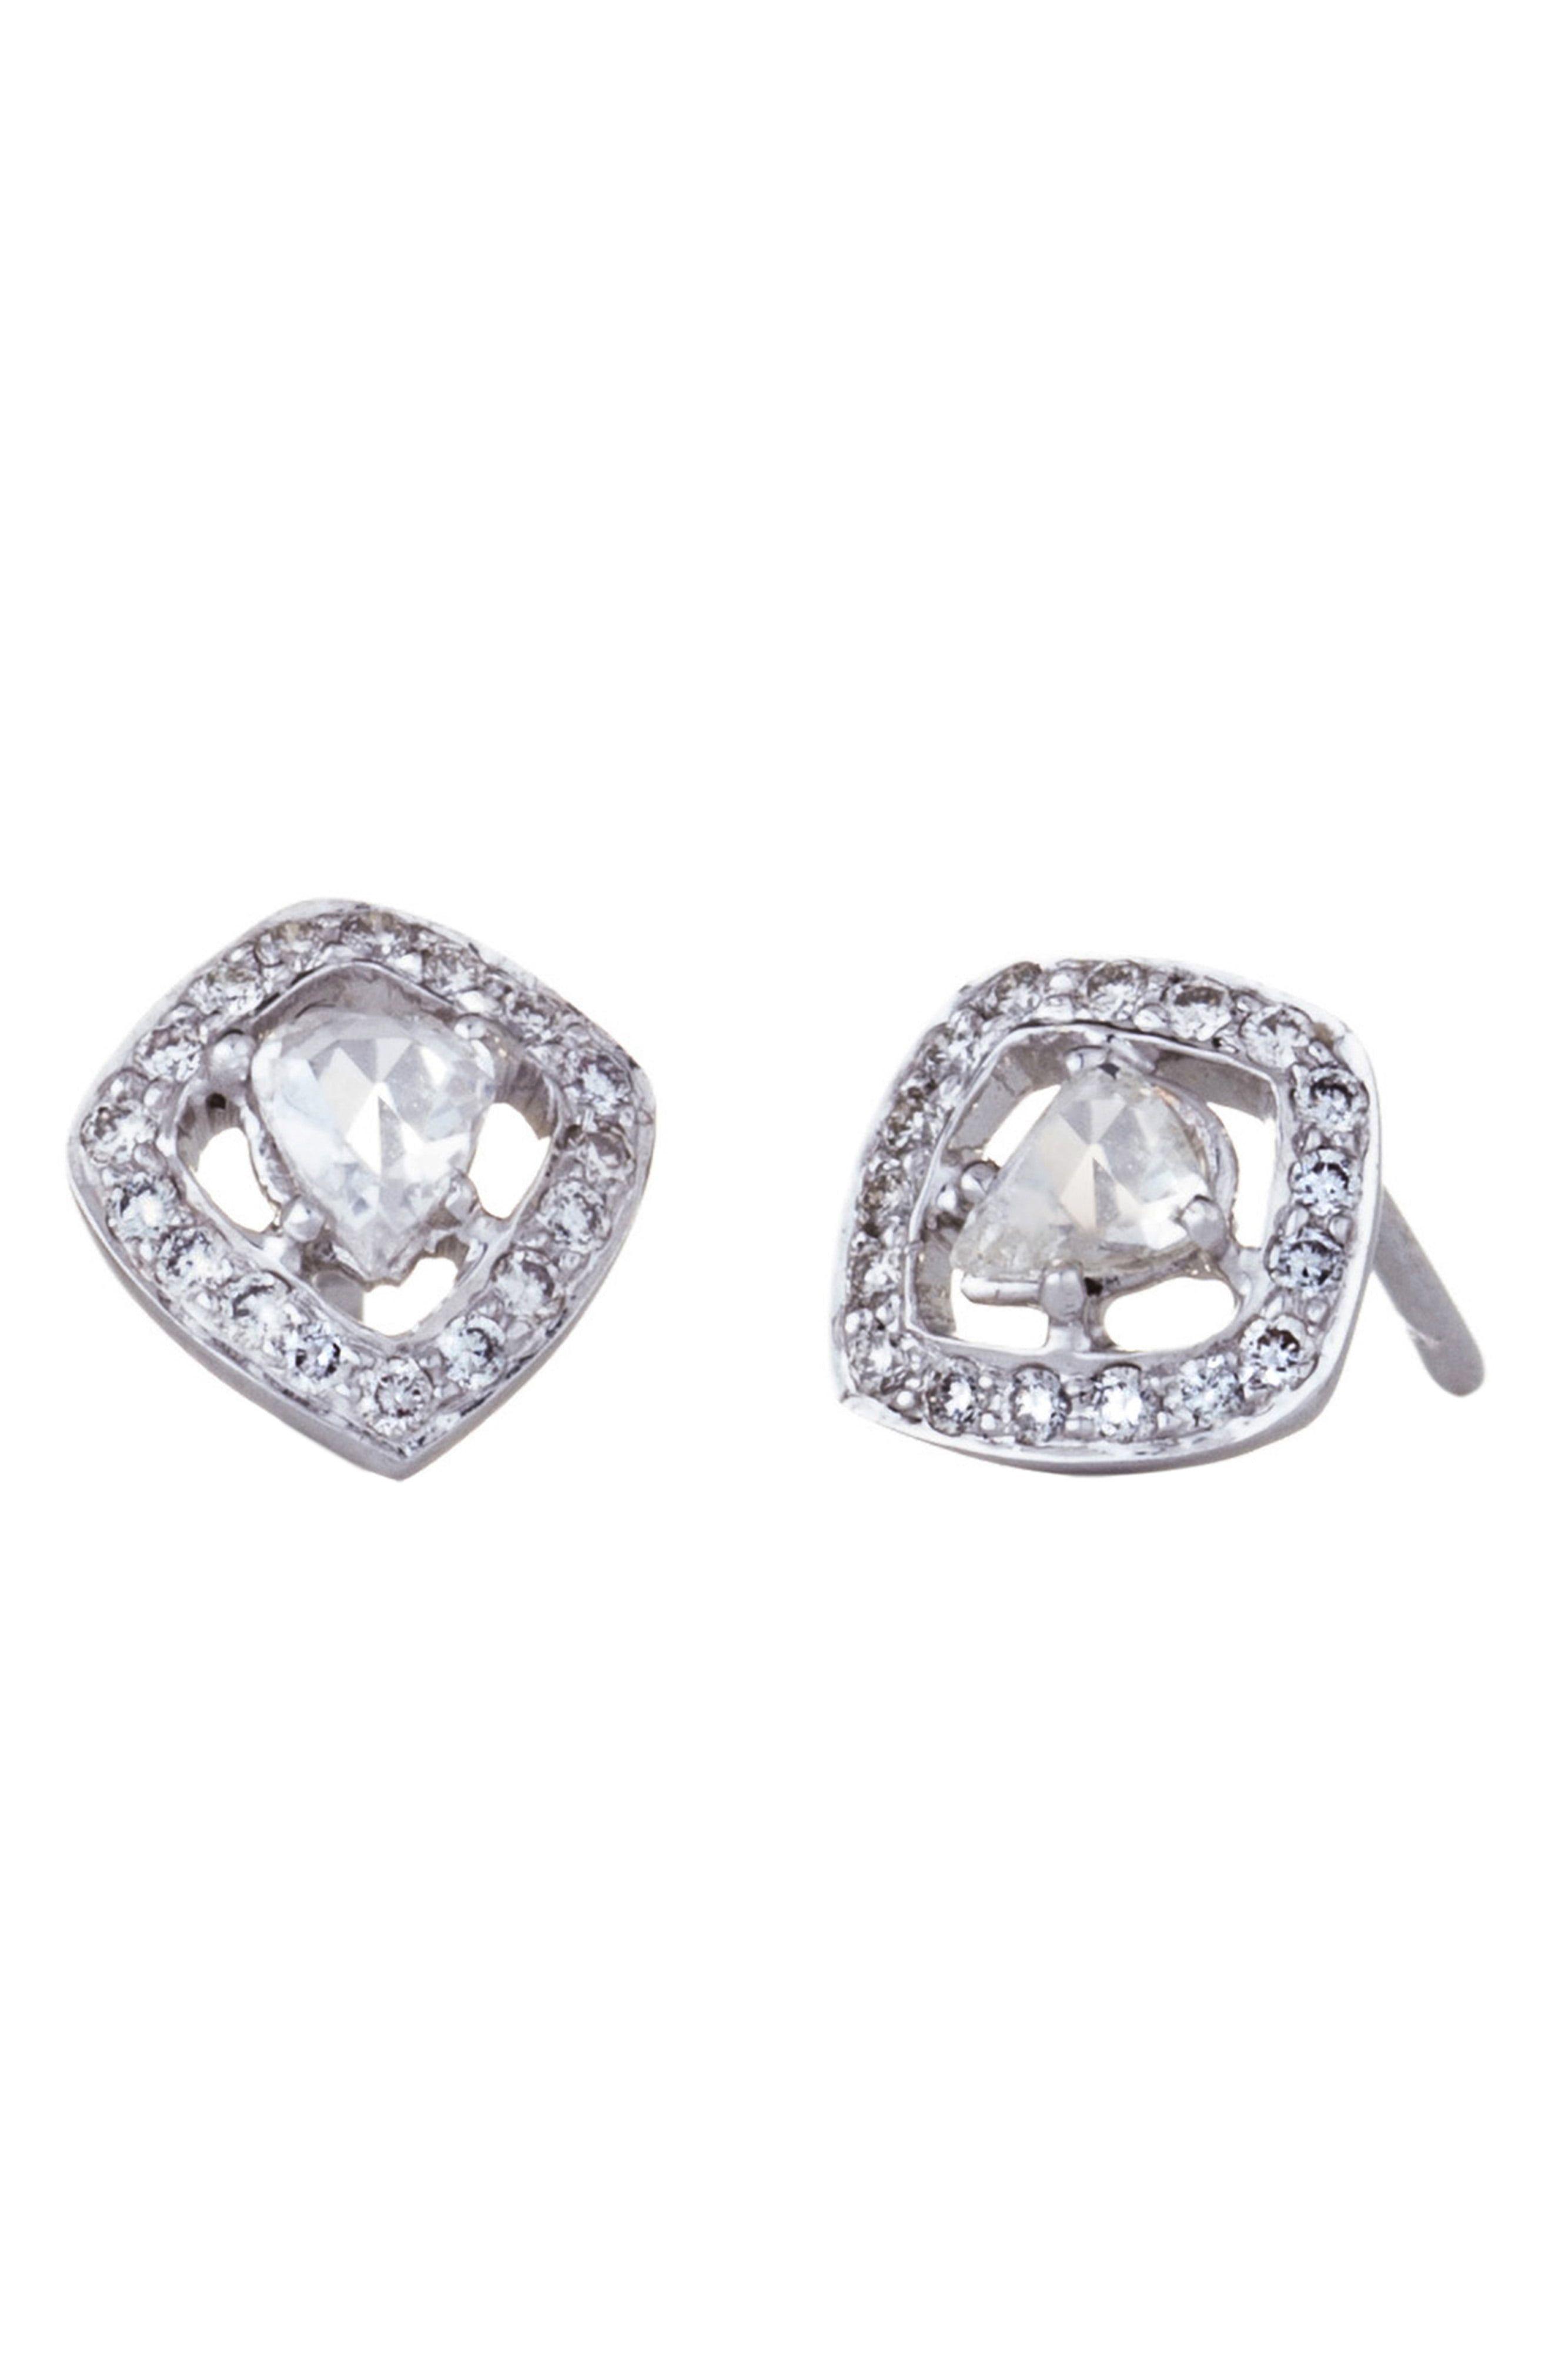 593fc2c72 Women's Sethi Couture Rose-Cut Diamond Stud Earrings in 2019 ...